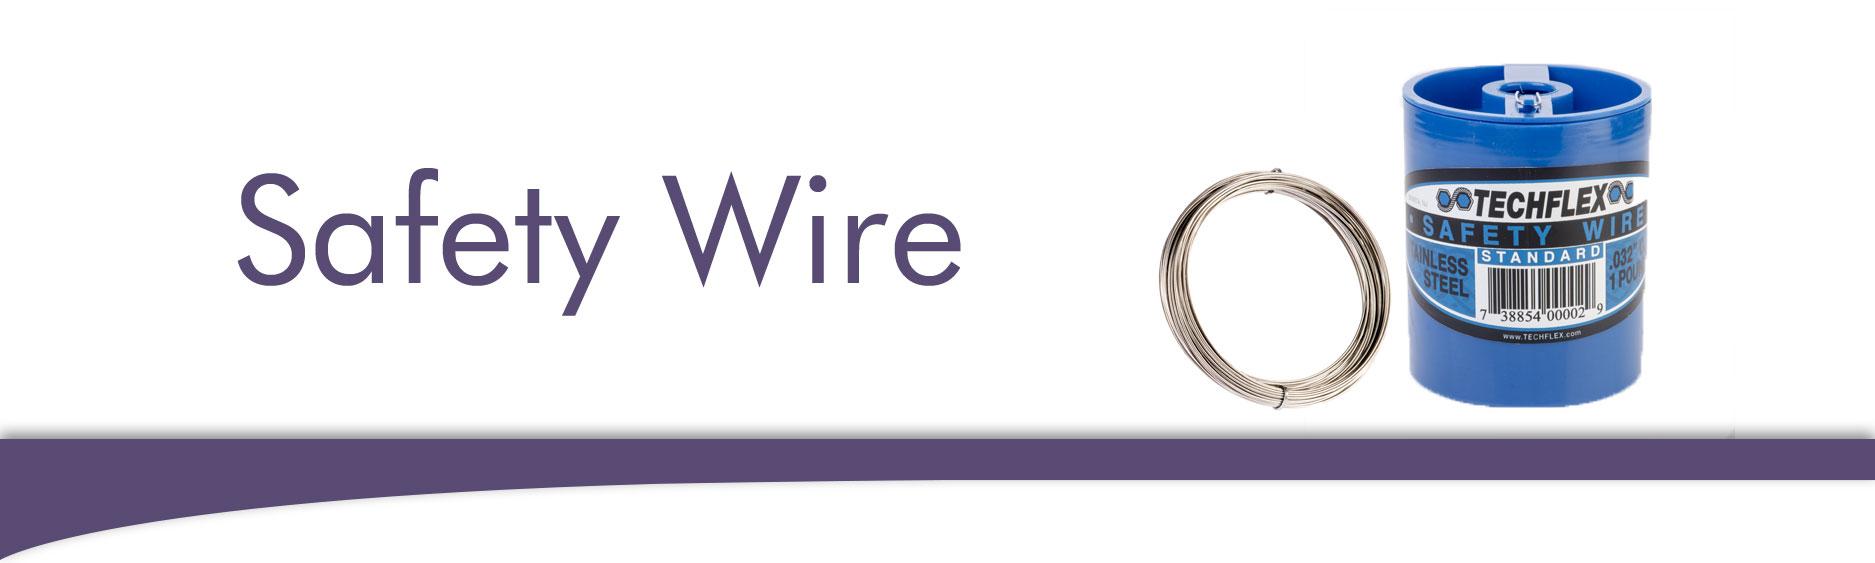 Safety Wire Light